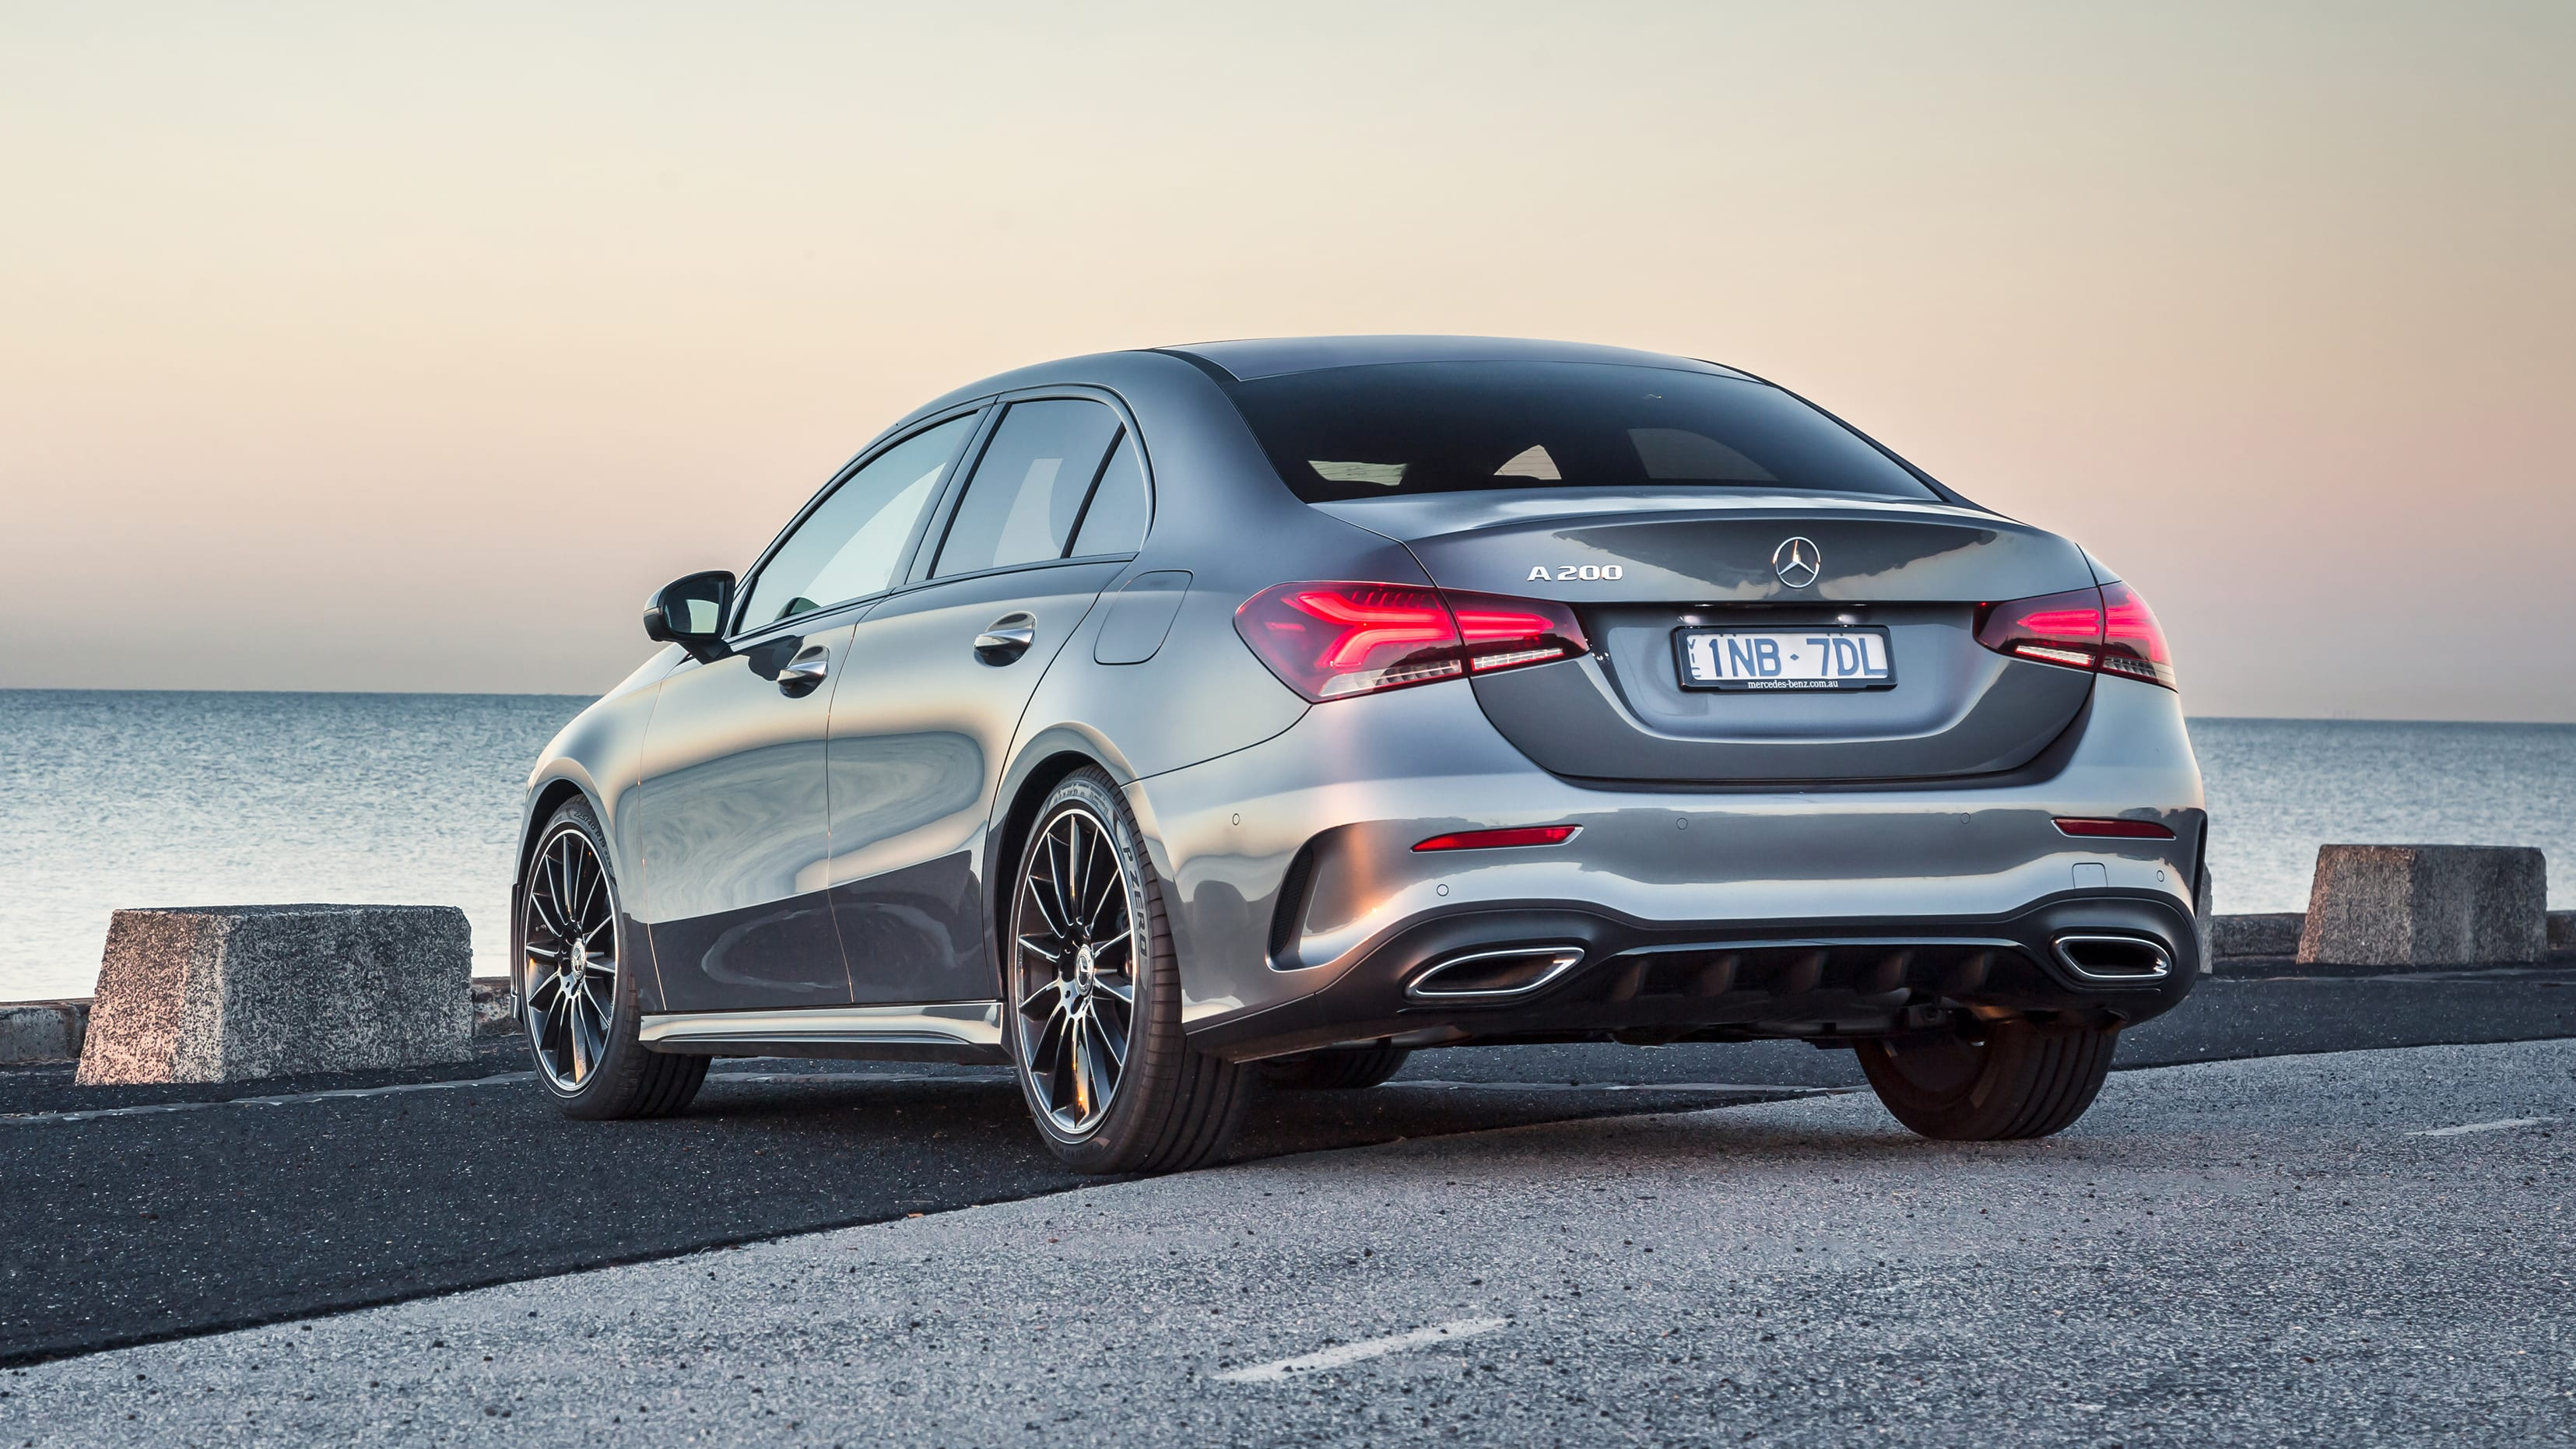 2019 Mercedes Benz A Class Sedan Review Caradvice